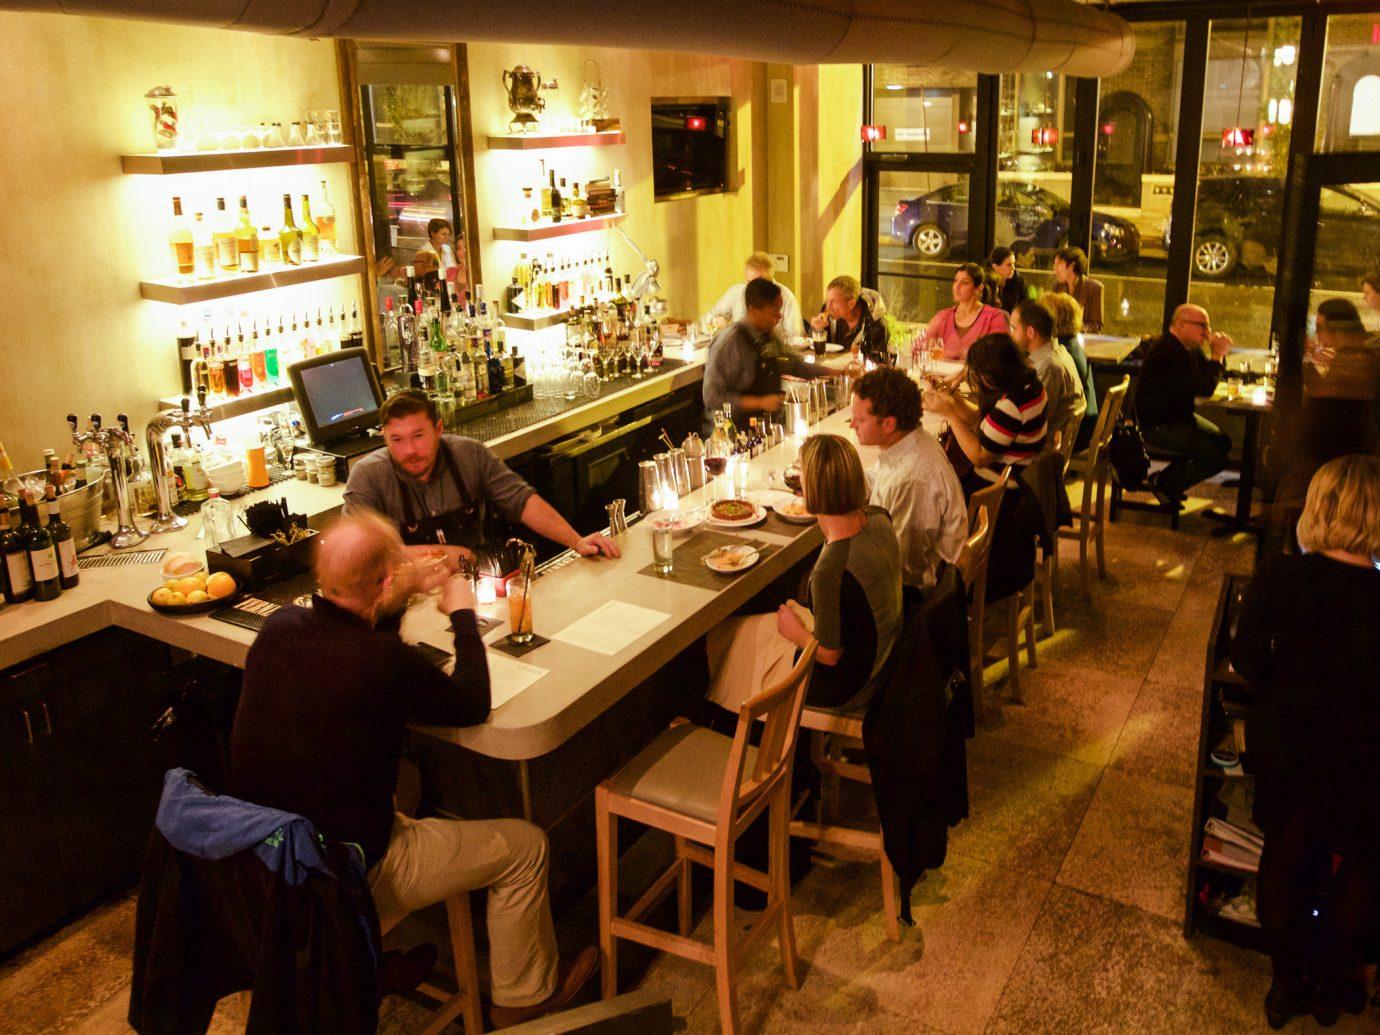 Food + Drink Phildelphia indoor floor person restaurant tavern Bar Drink café pub food table